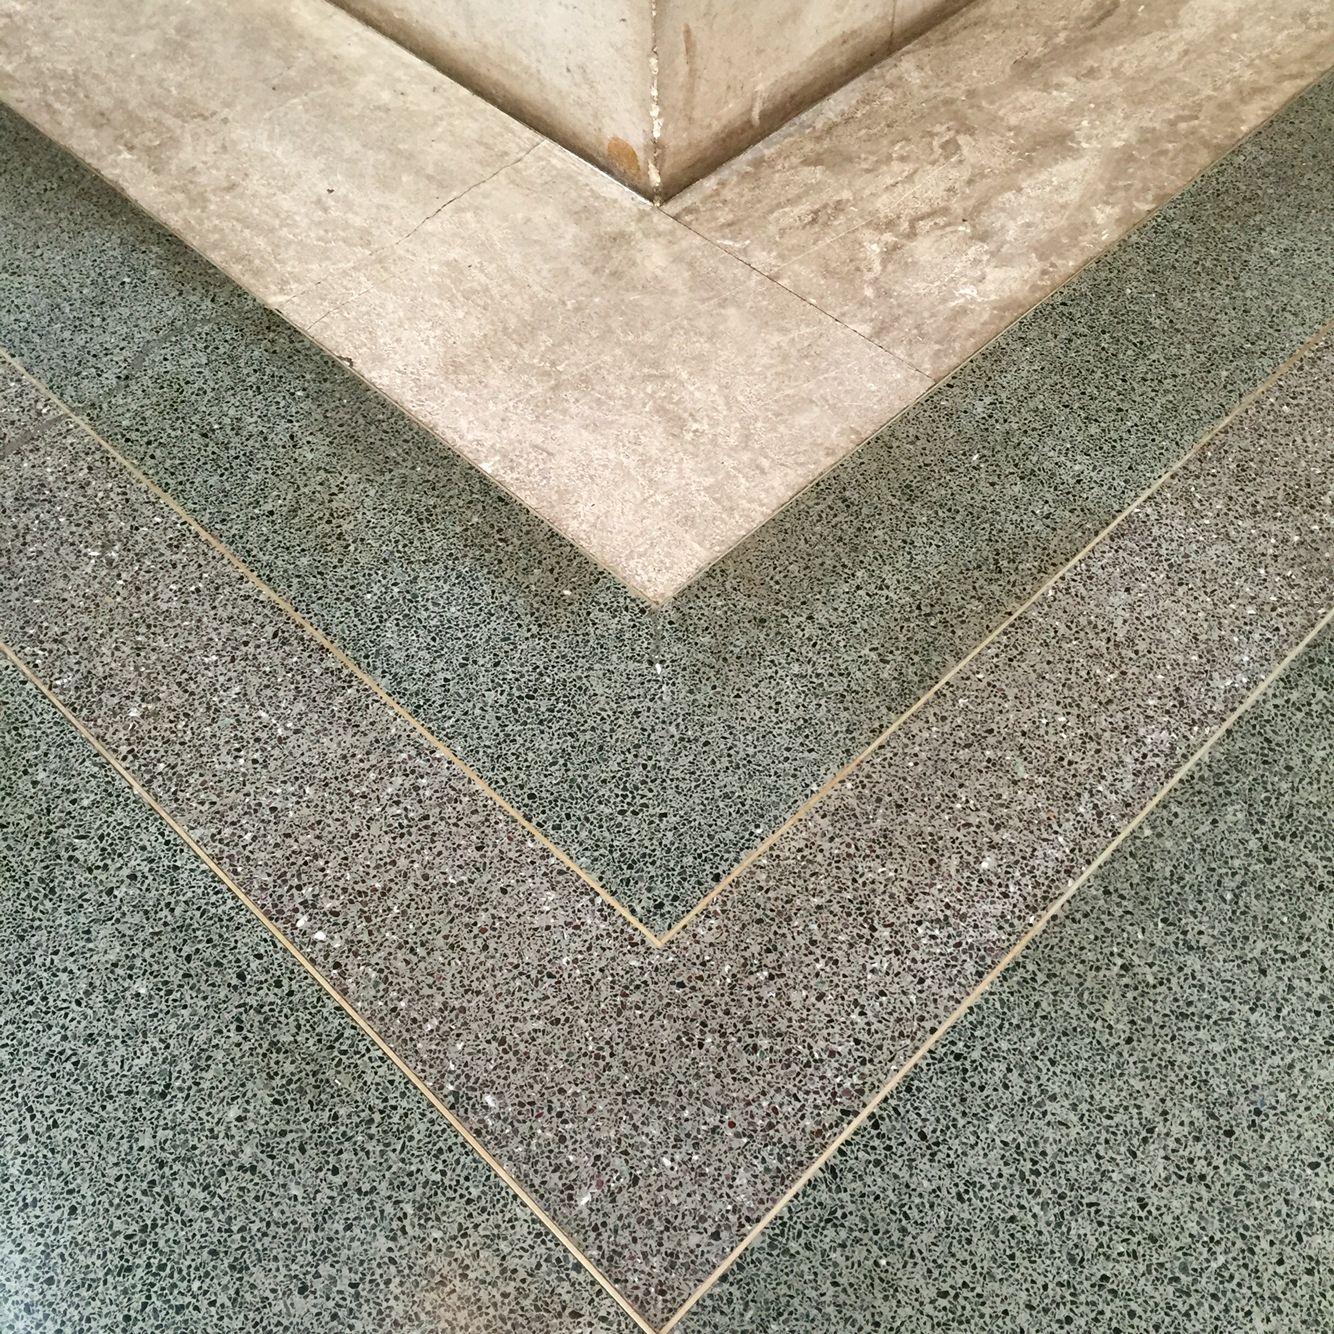 Tate Britain Terrazzo Floor Dream Home Ideas Favorite Spaces In